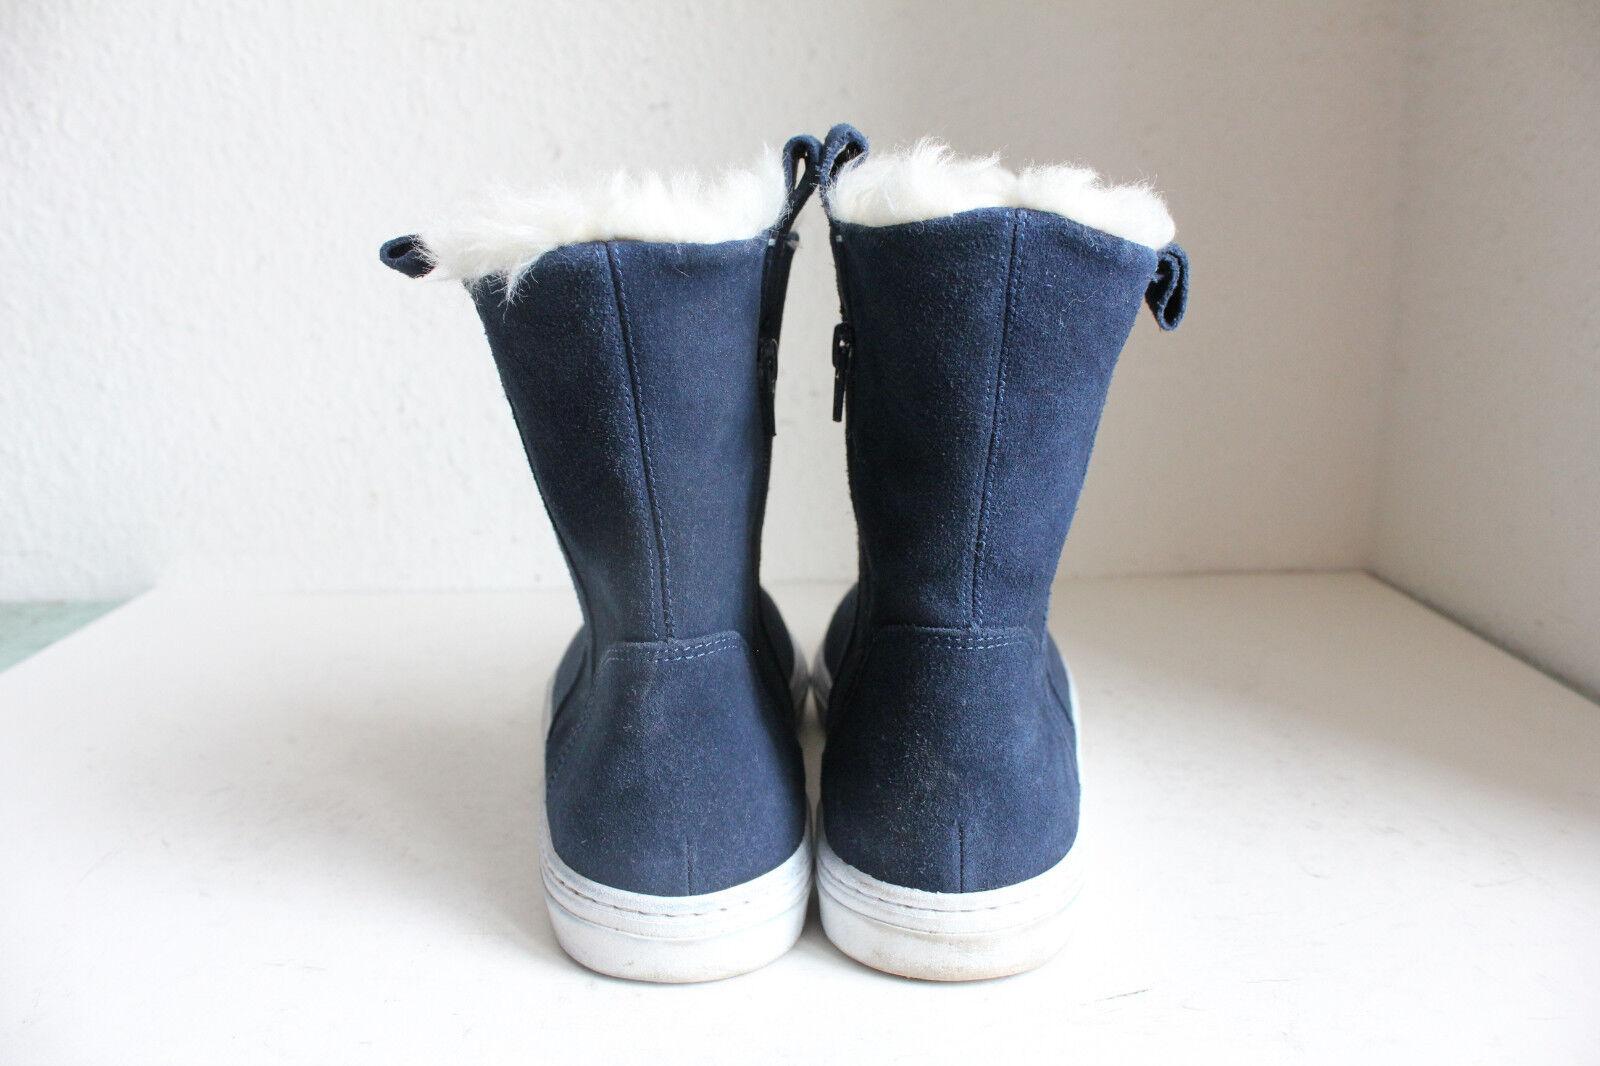 Zara Trafuluc Trendy Winter Mode Stiefeletten Stiefel Stiefel Stiefel Echtleder Dunkelblau Eu:41 50f0e4